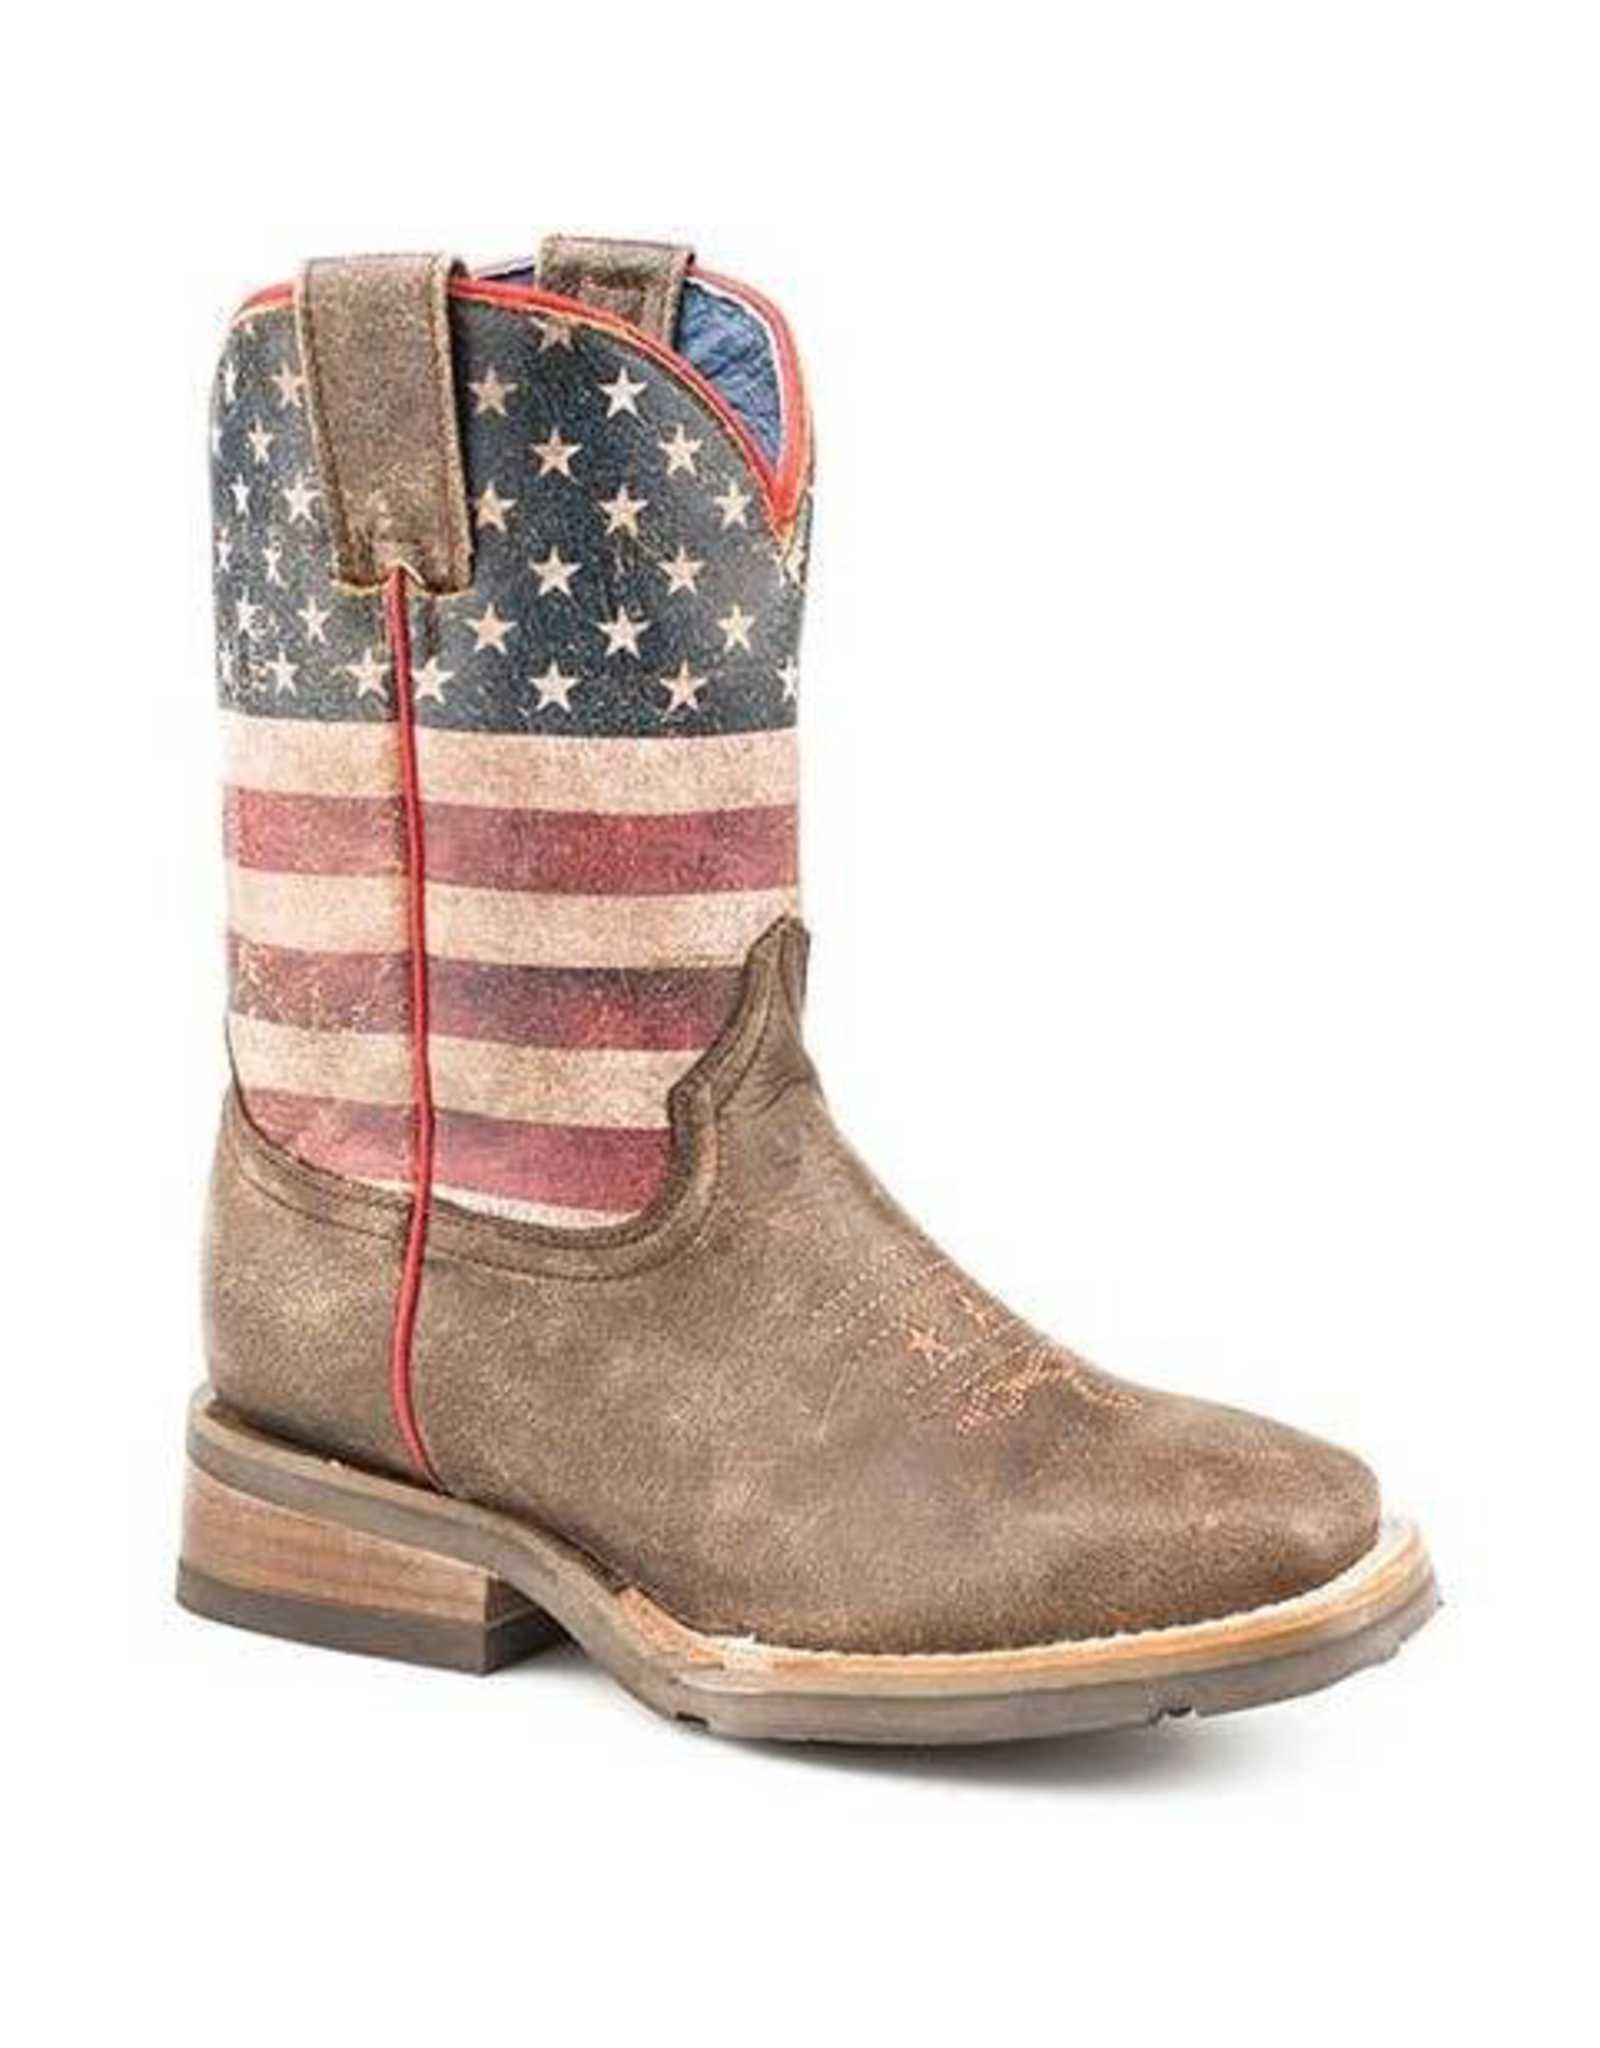 Boots-Children ROPER 09-018-7001-1368 Little America